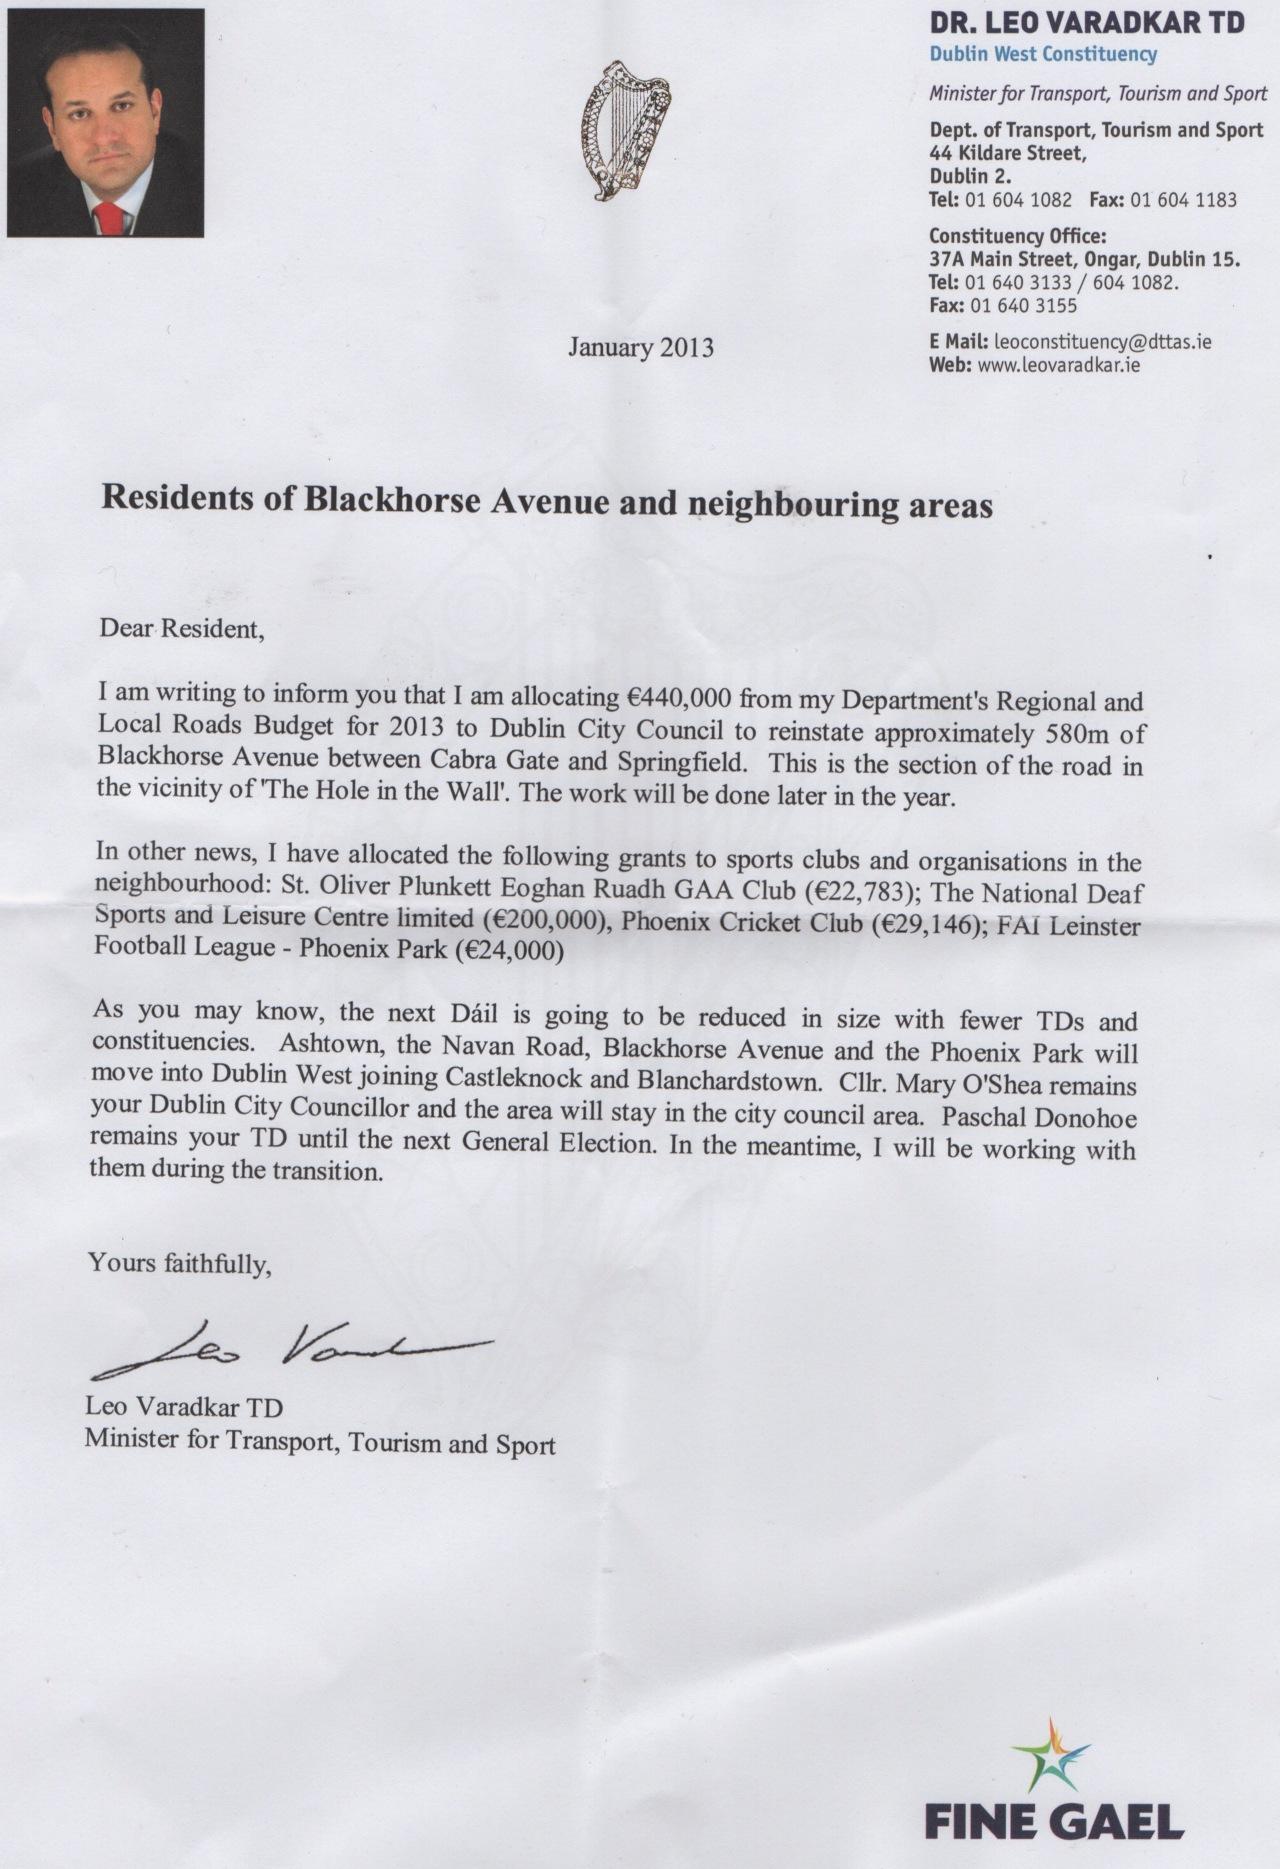 Letter from Minister Leo Varadkar outlining grants issued